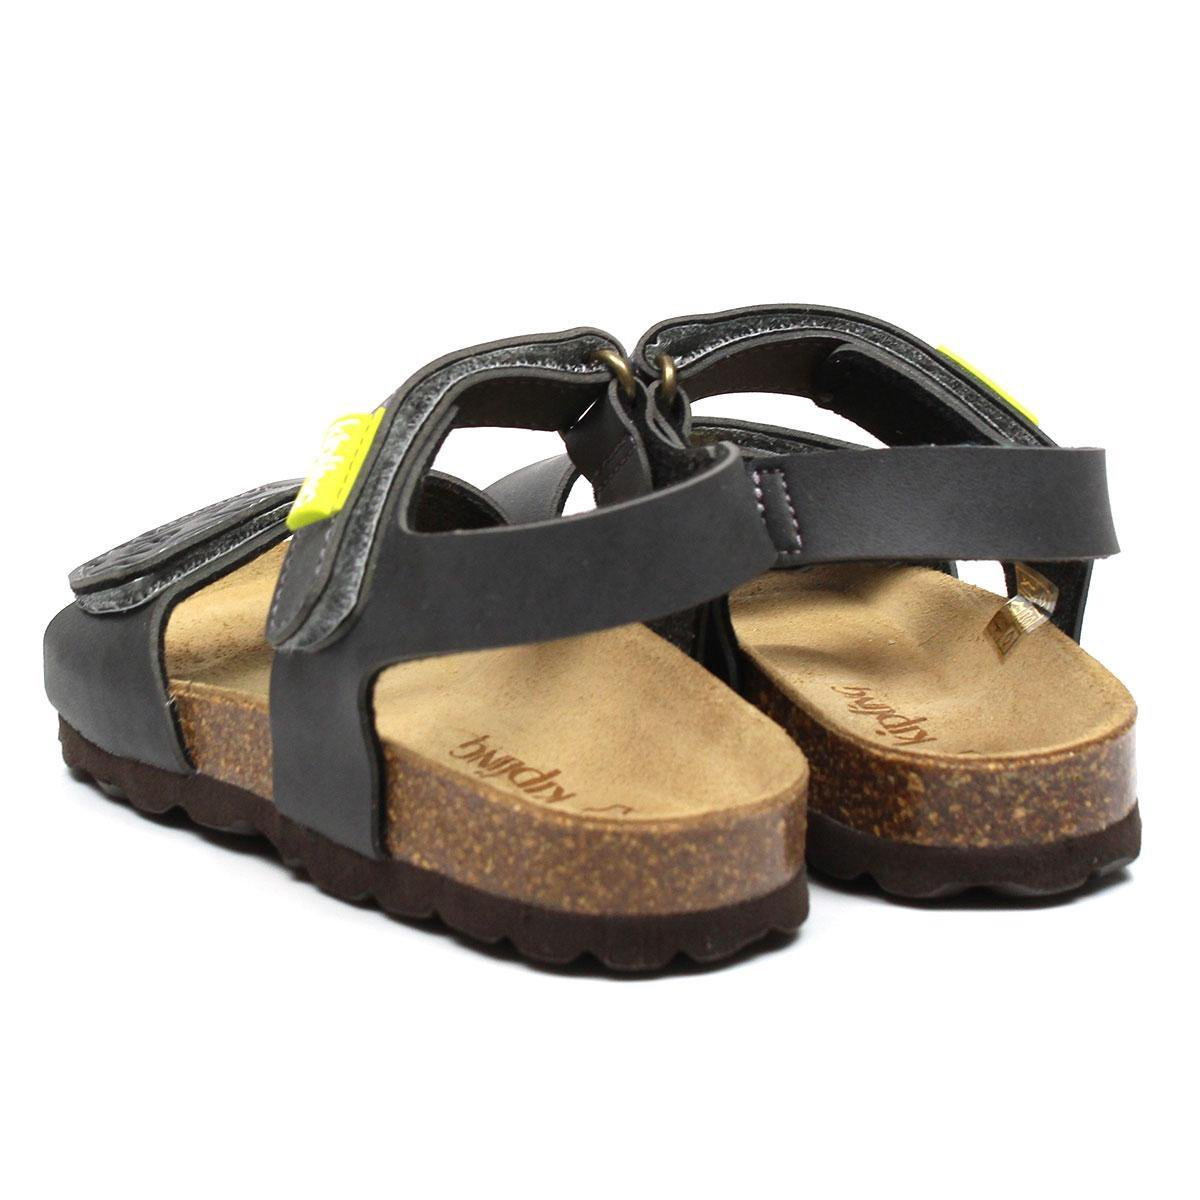 Kipling GUY jongens sandaal grijs, ,29